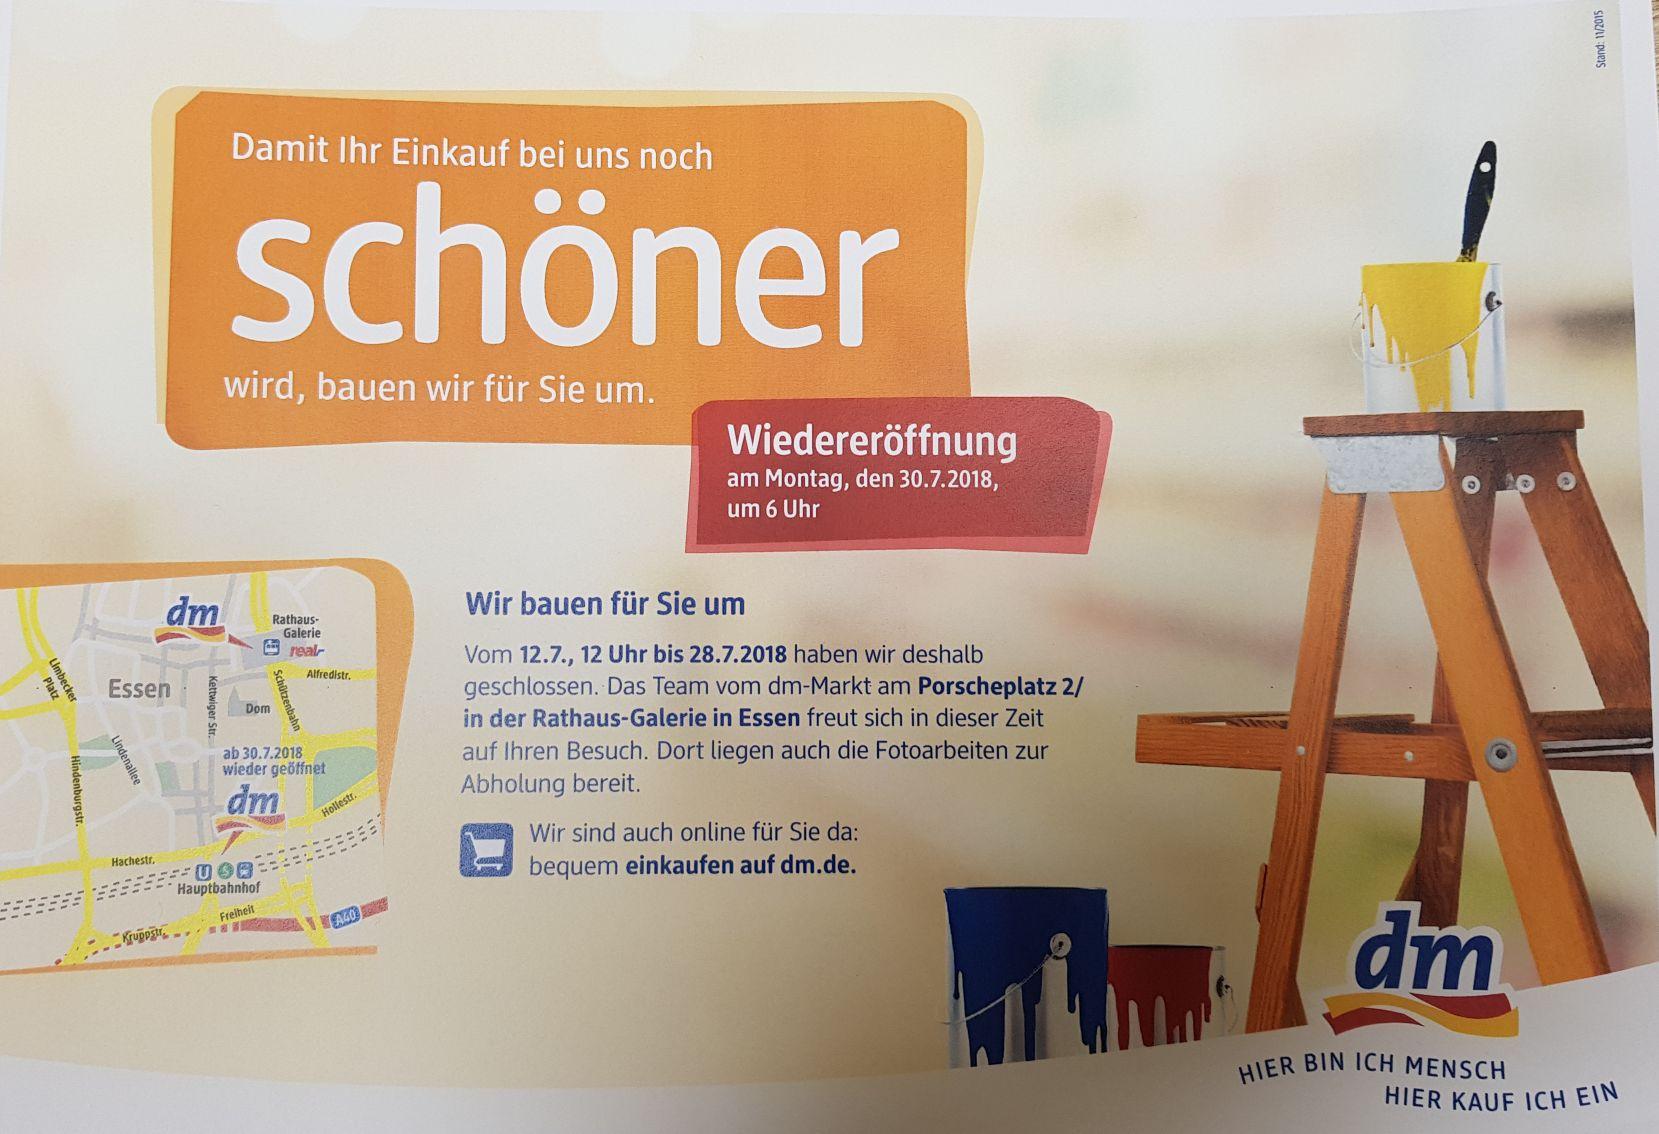 [Lokal] dm am Essener Hauptbahnhof 20% Rabatt am 10. + 11.07.